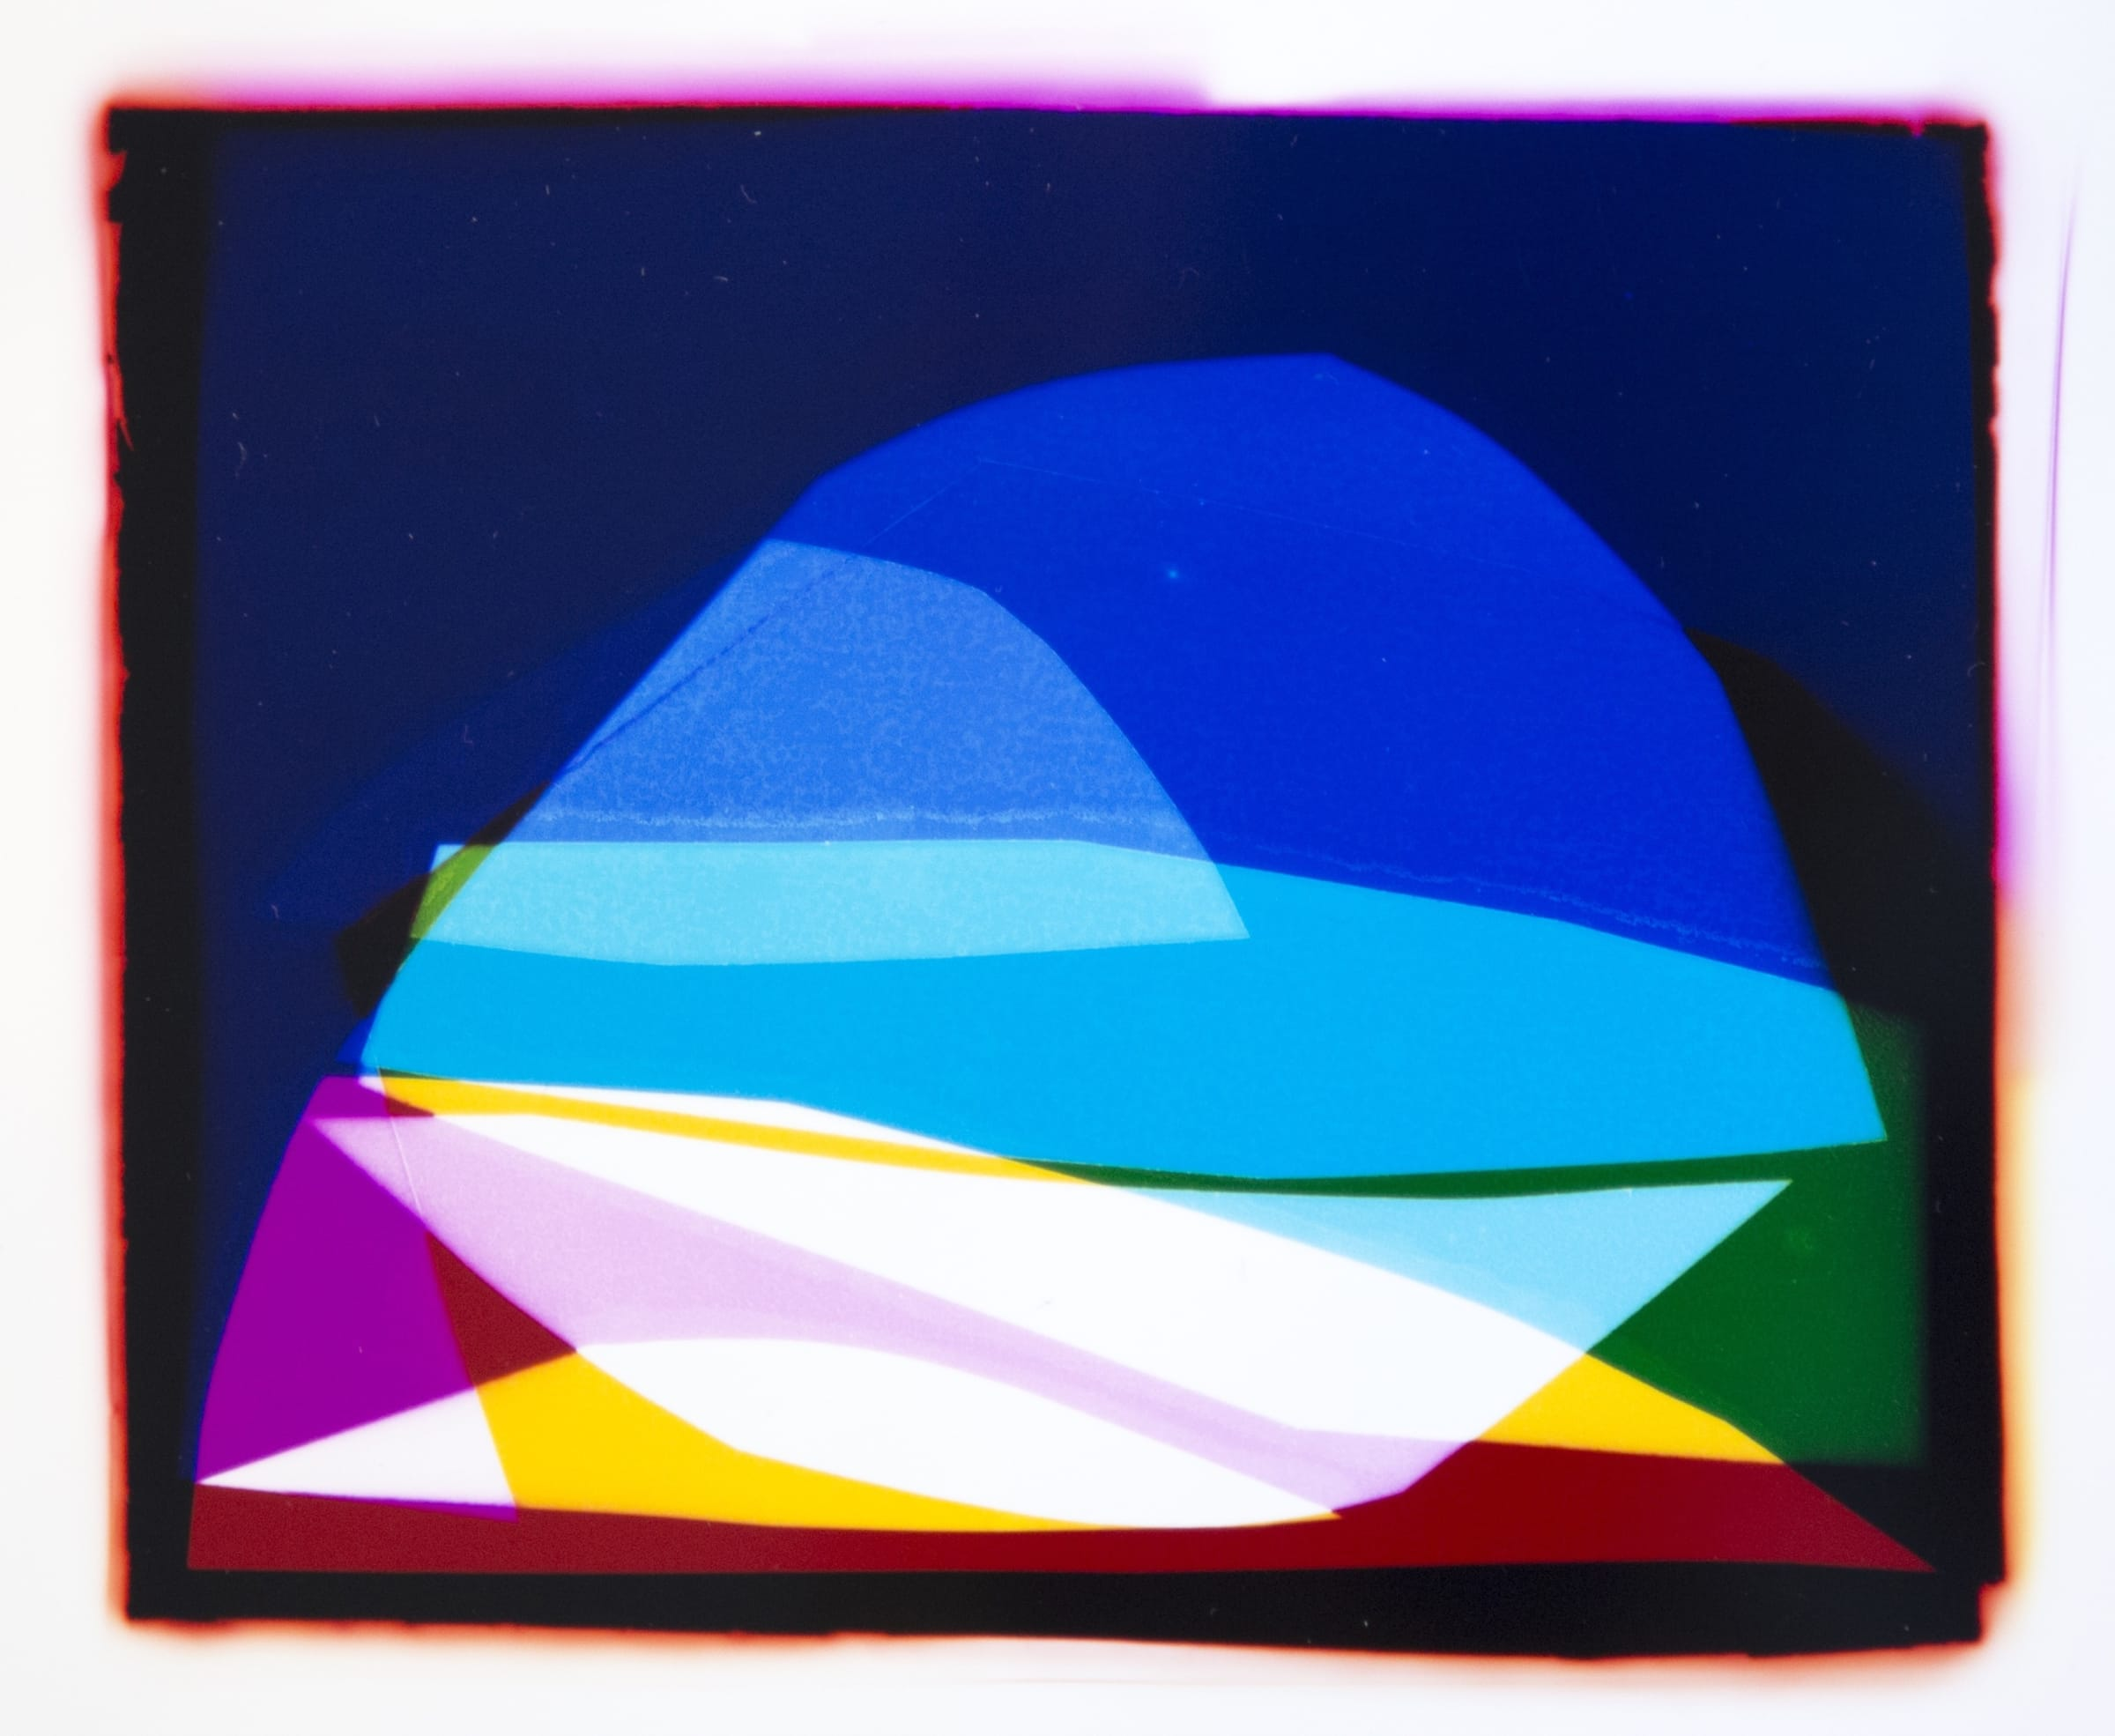 "<span class=""link fancybox-details-link""><a href=""/artists/26-liz-nielsen/works/359-liz-nielsen-vacation-dimension-2019/"">View Detail Page</a></span><div class=""artist""><strong>Liz Nielsen</strong></div> <div class=""title""><em>Vacation Dimension</em>, 2019</div> <div class=""medium"">Analogue Chromogenic Photogram on Fujiflex<br /> Unique</div> <div class=""dimensions"">12.7 x 10.2 cm<br /> 5 x 4 in<br /> Print only</div><div class=""copyright_line"">Copyright Liz Nielsen</div>"